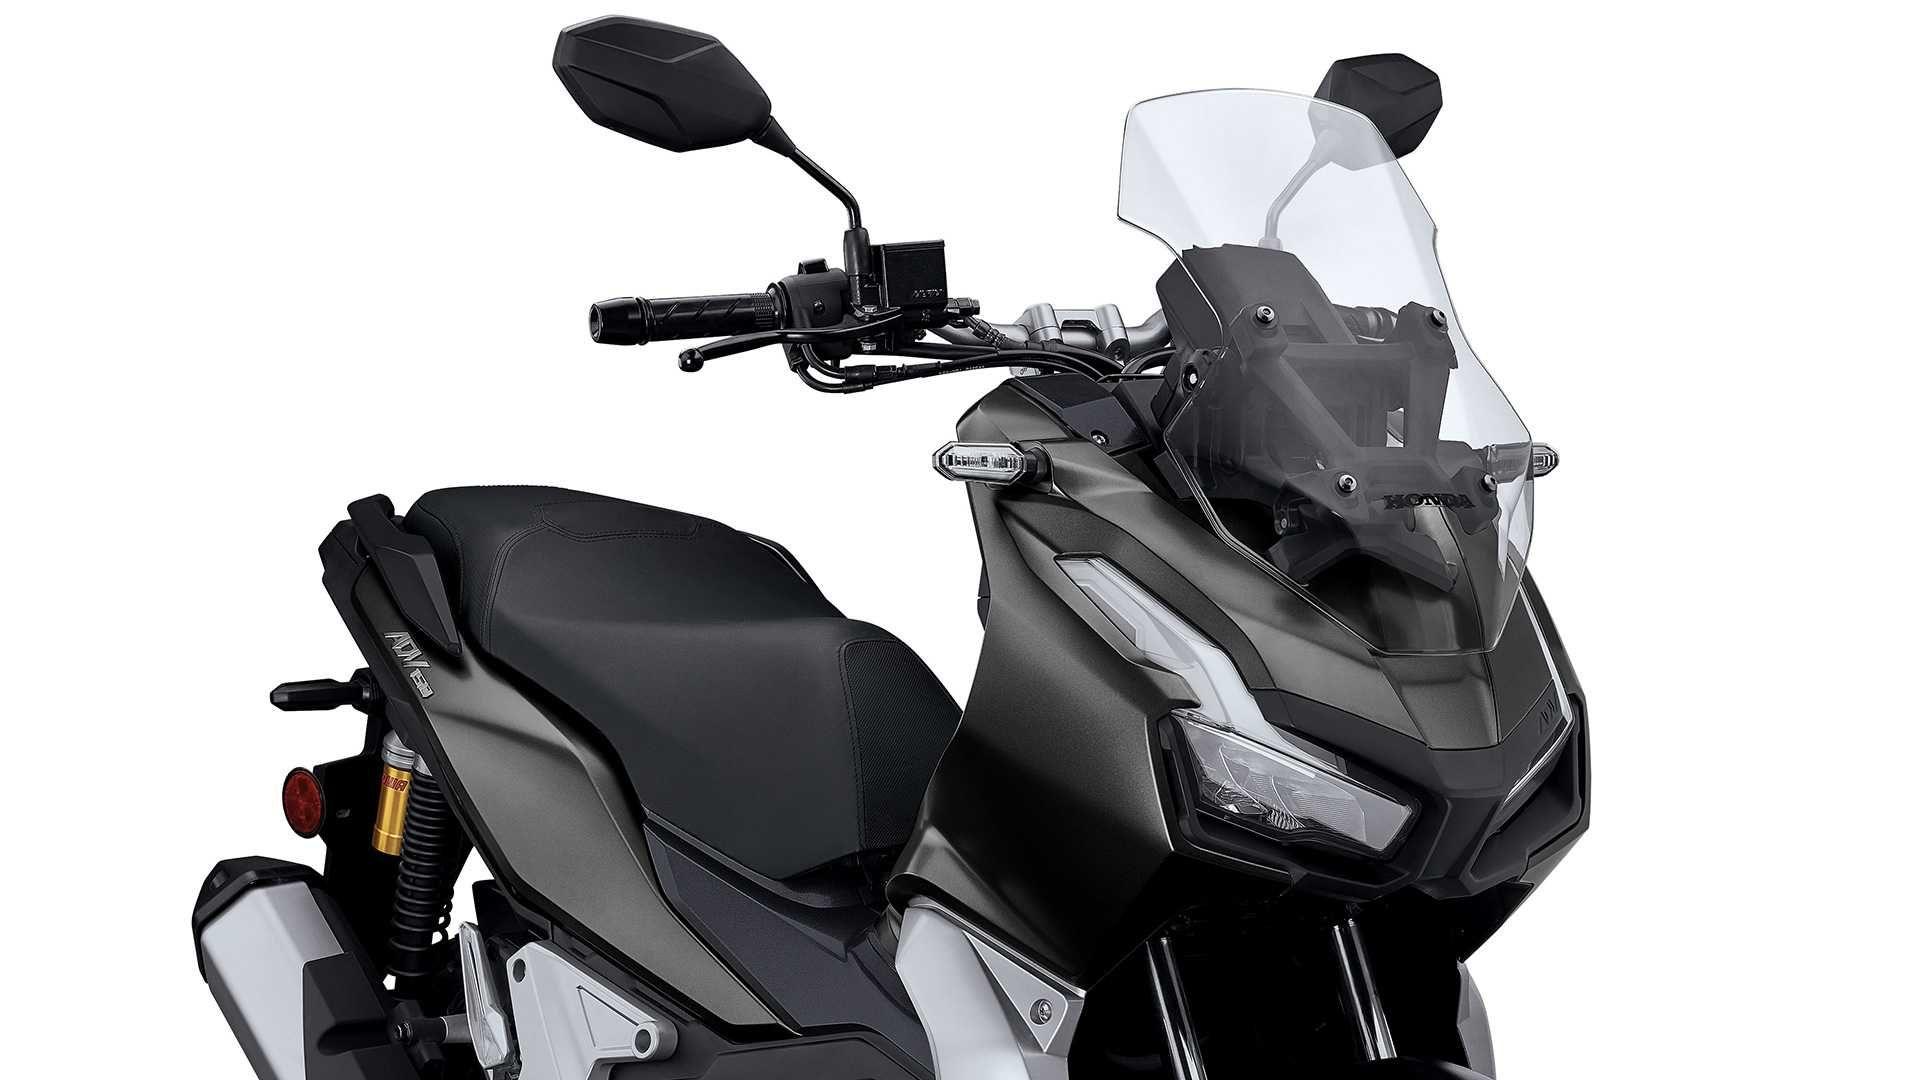 2021 Honda Adv150 Everything We Know Honda Honda Models Motorcycle Types